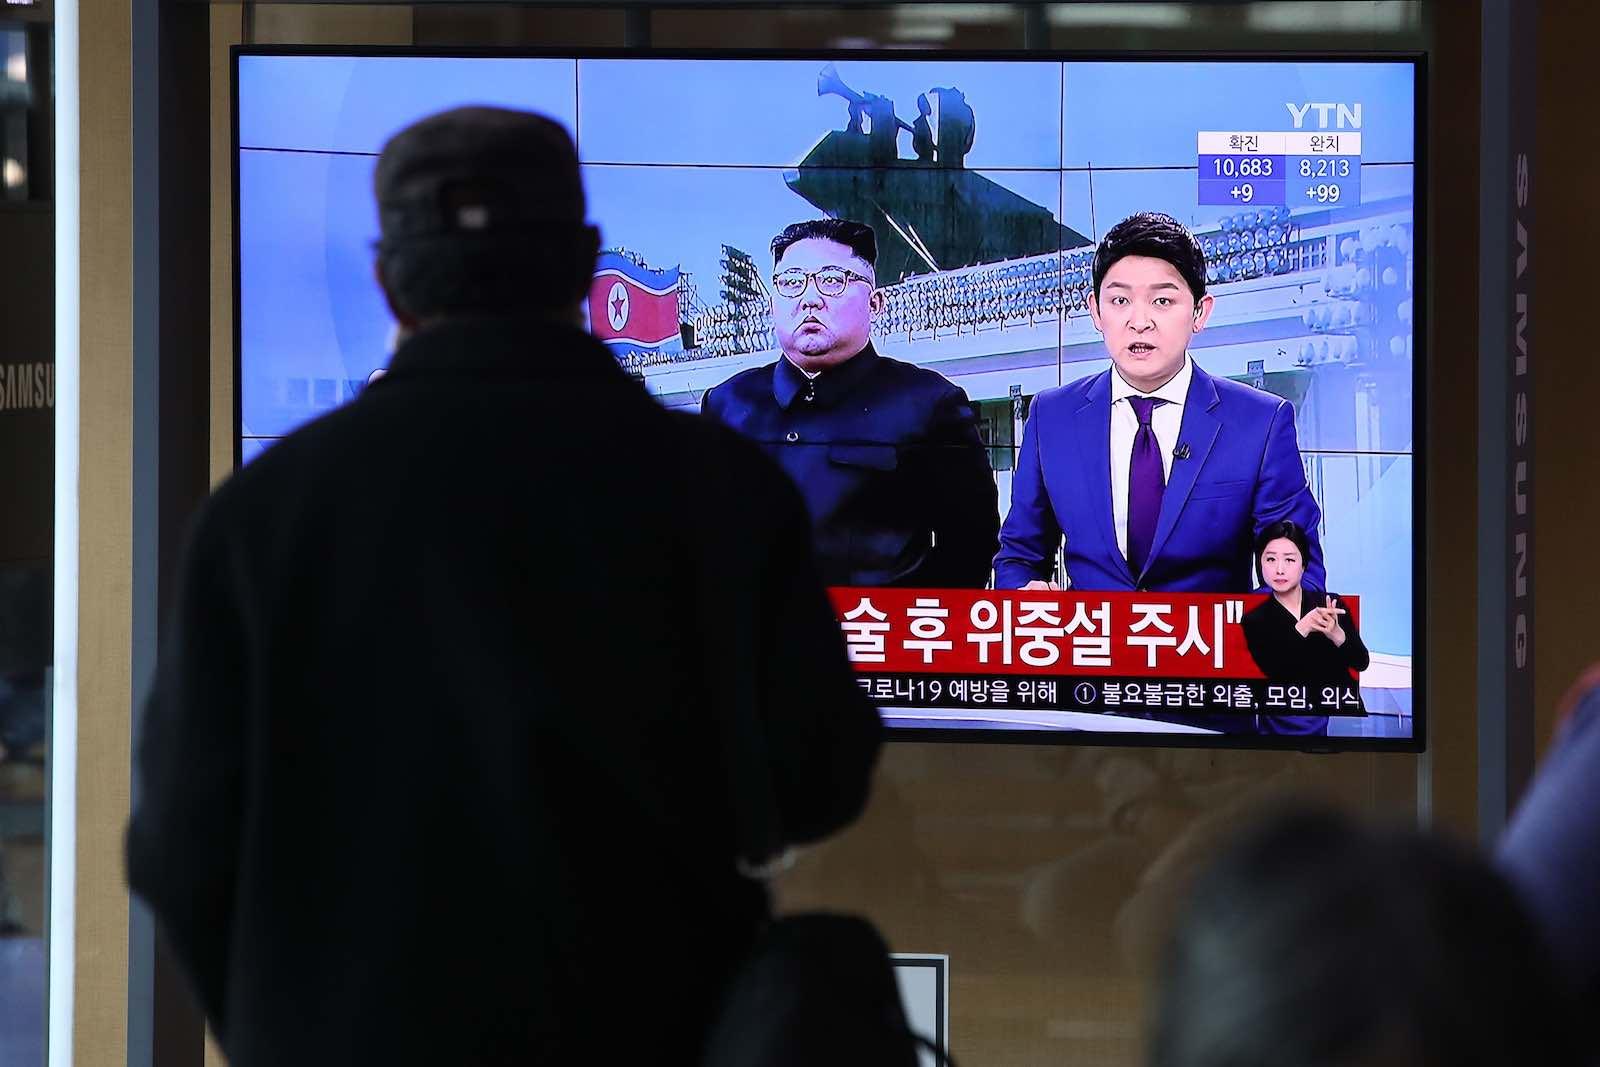 North Korean Leader Kim Jong Un's Health Under Speculation After Surgery